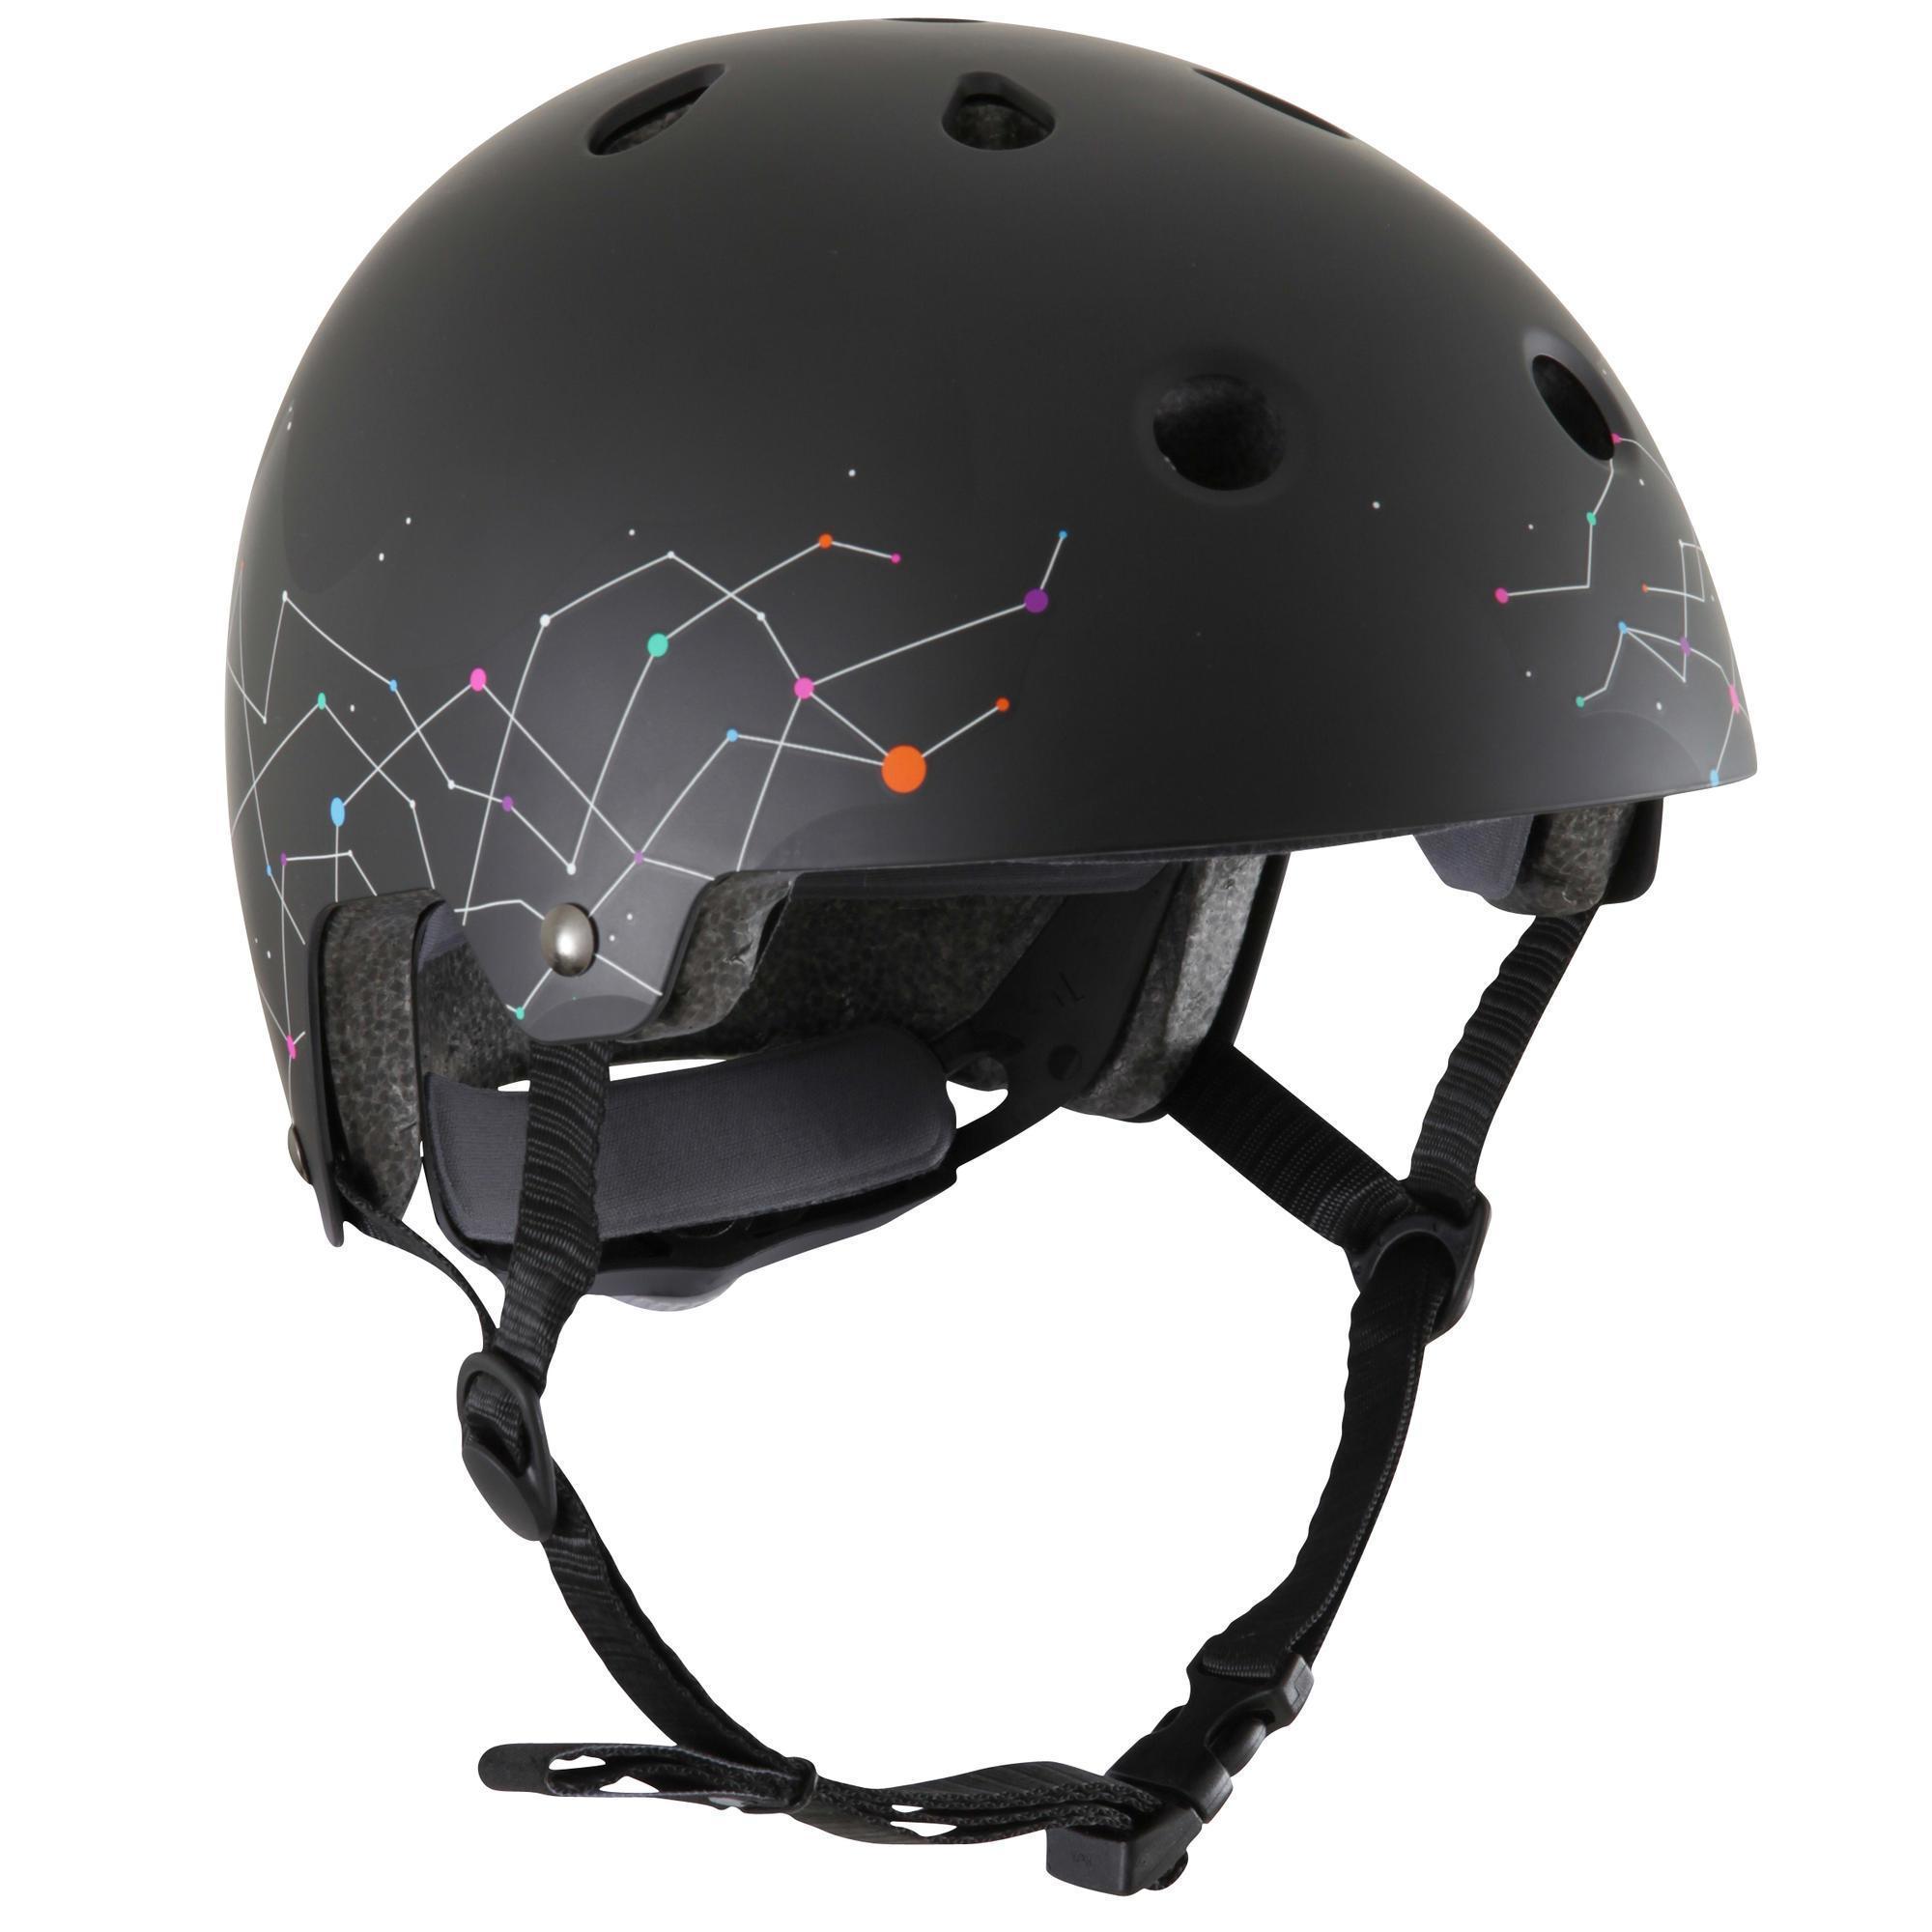 Roller skates helmet - Roller Skates Helmet 25